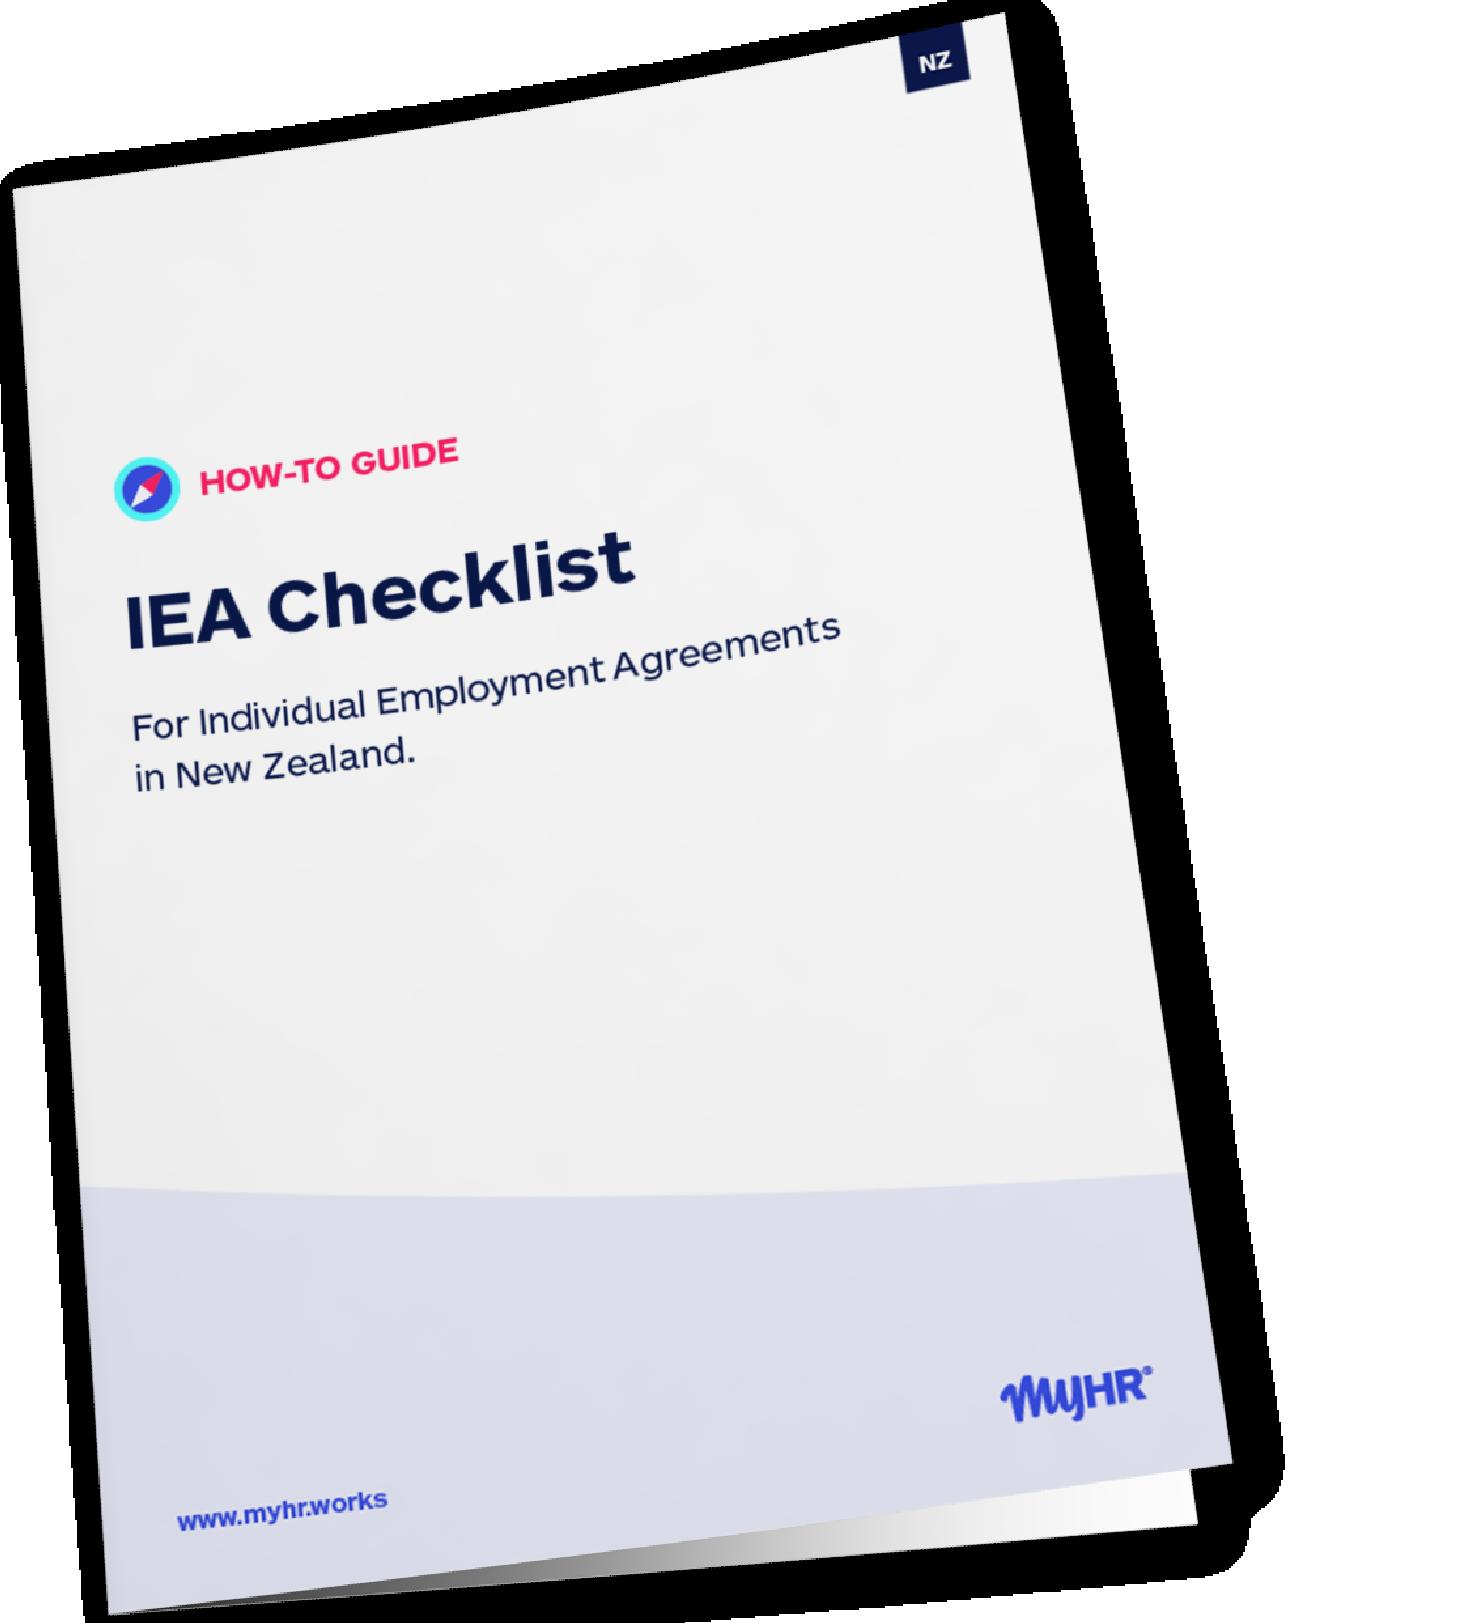 MyHR_NZ IEA Checklist Mockup